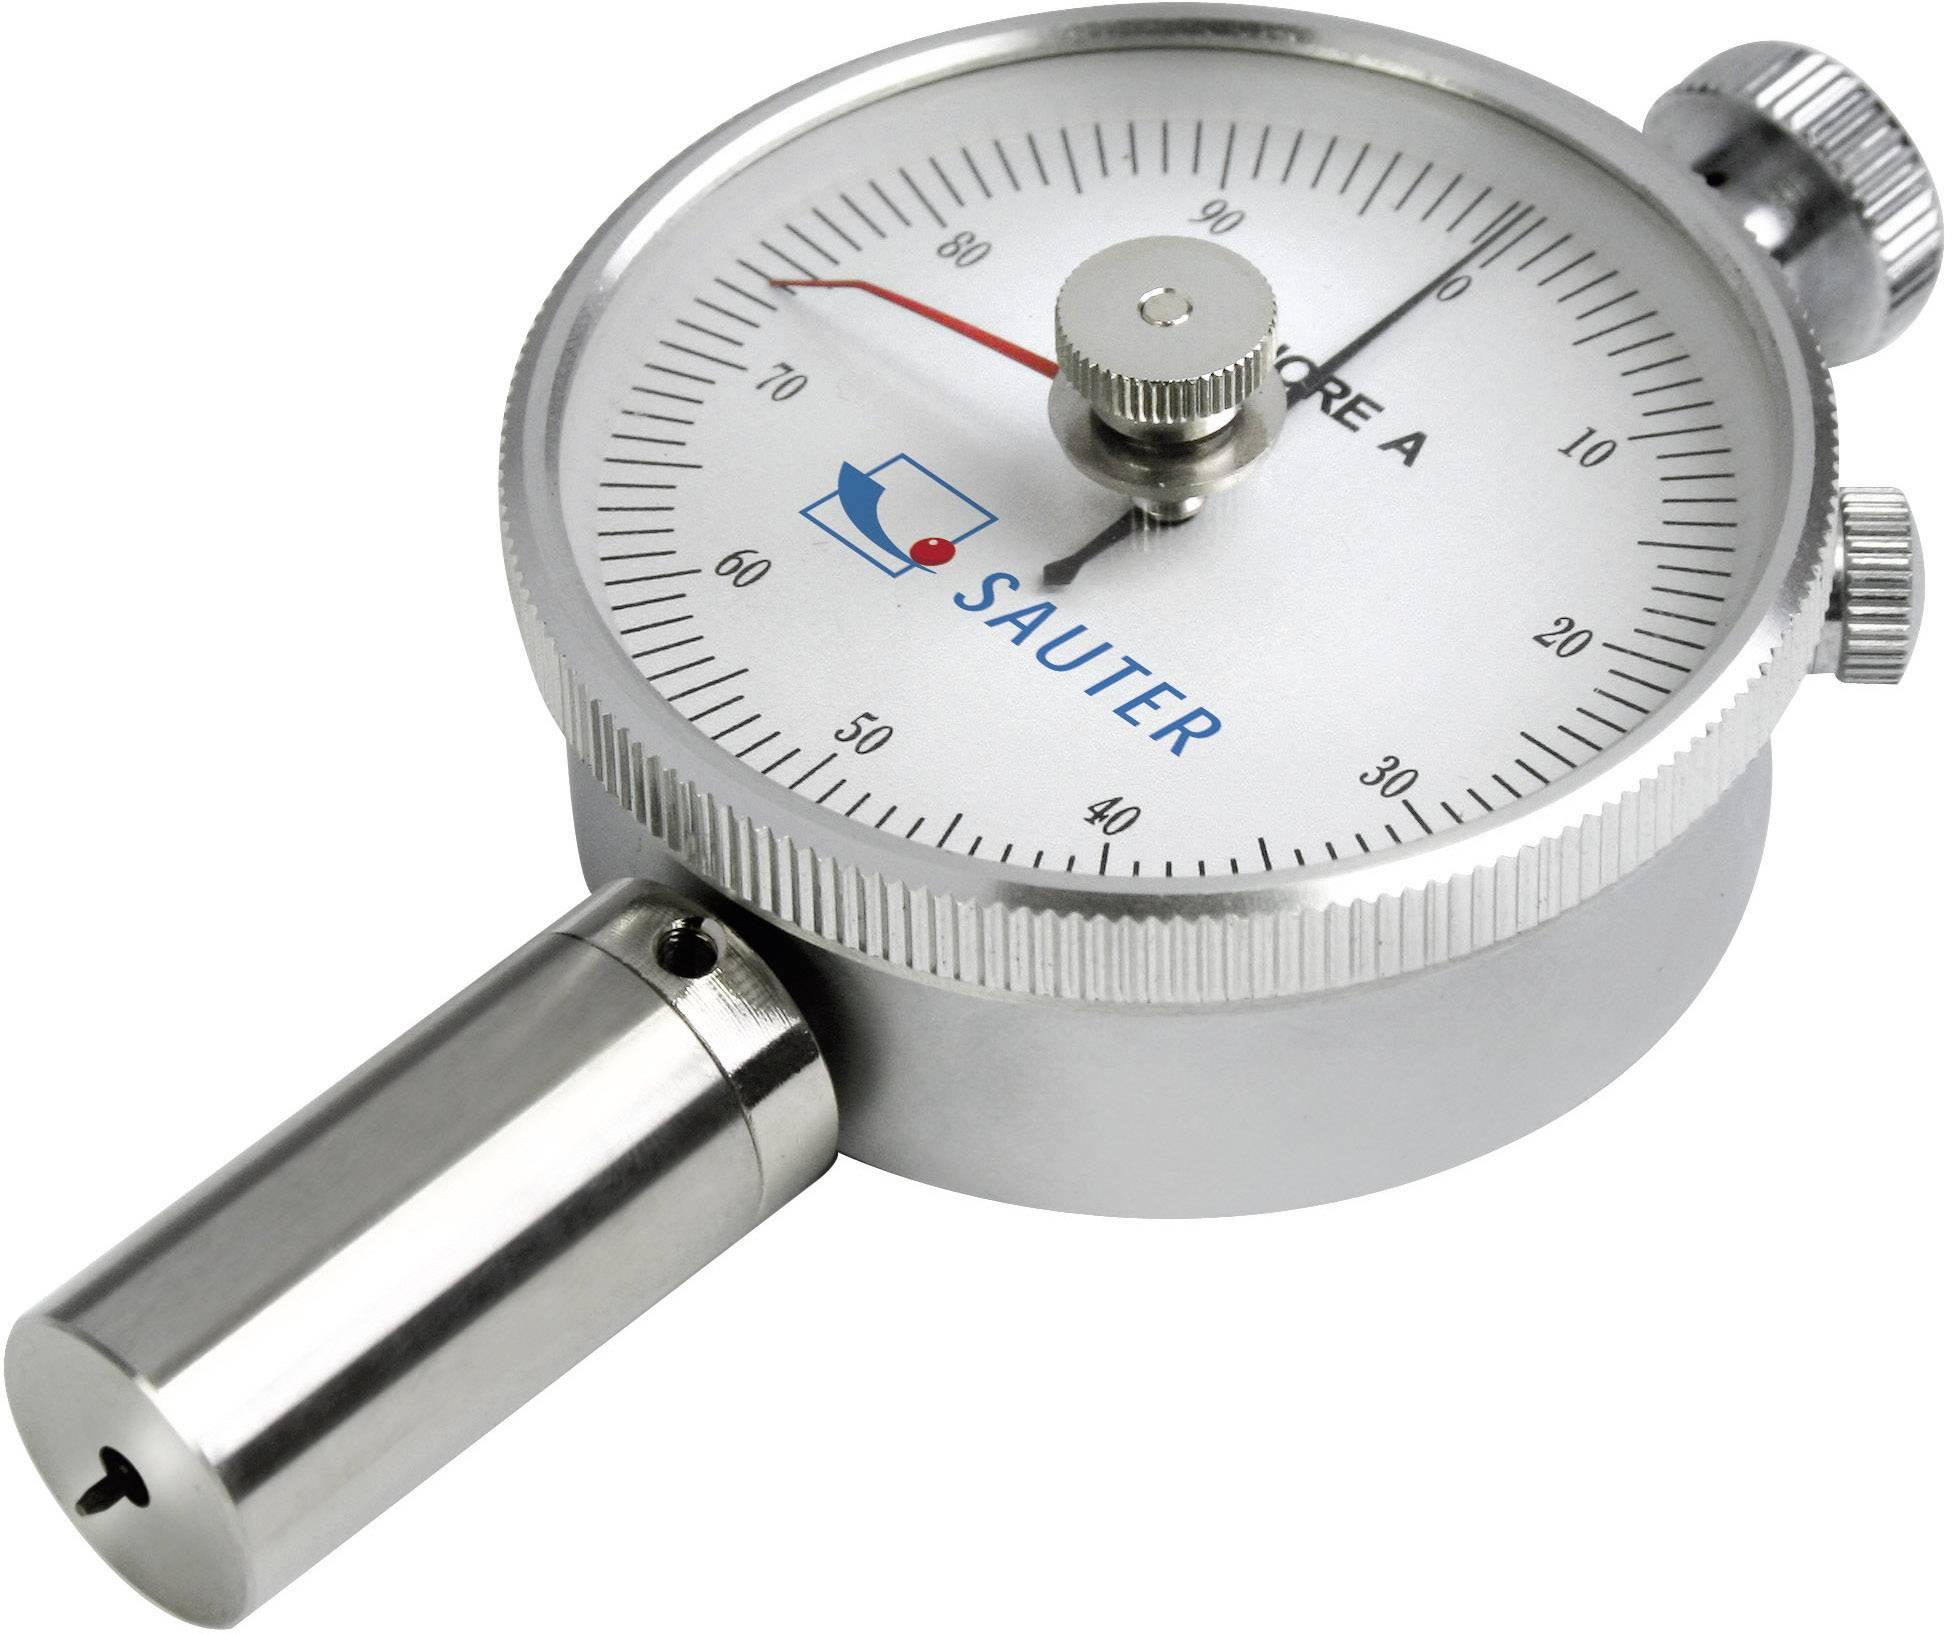 Merač tvrdosti materiálov Sauter HBC 100-0